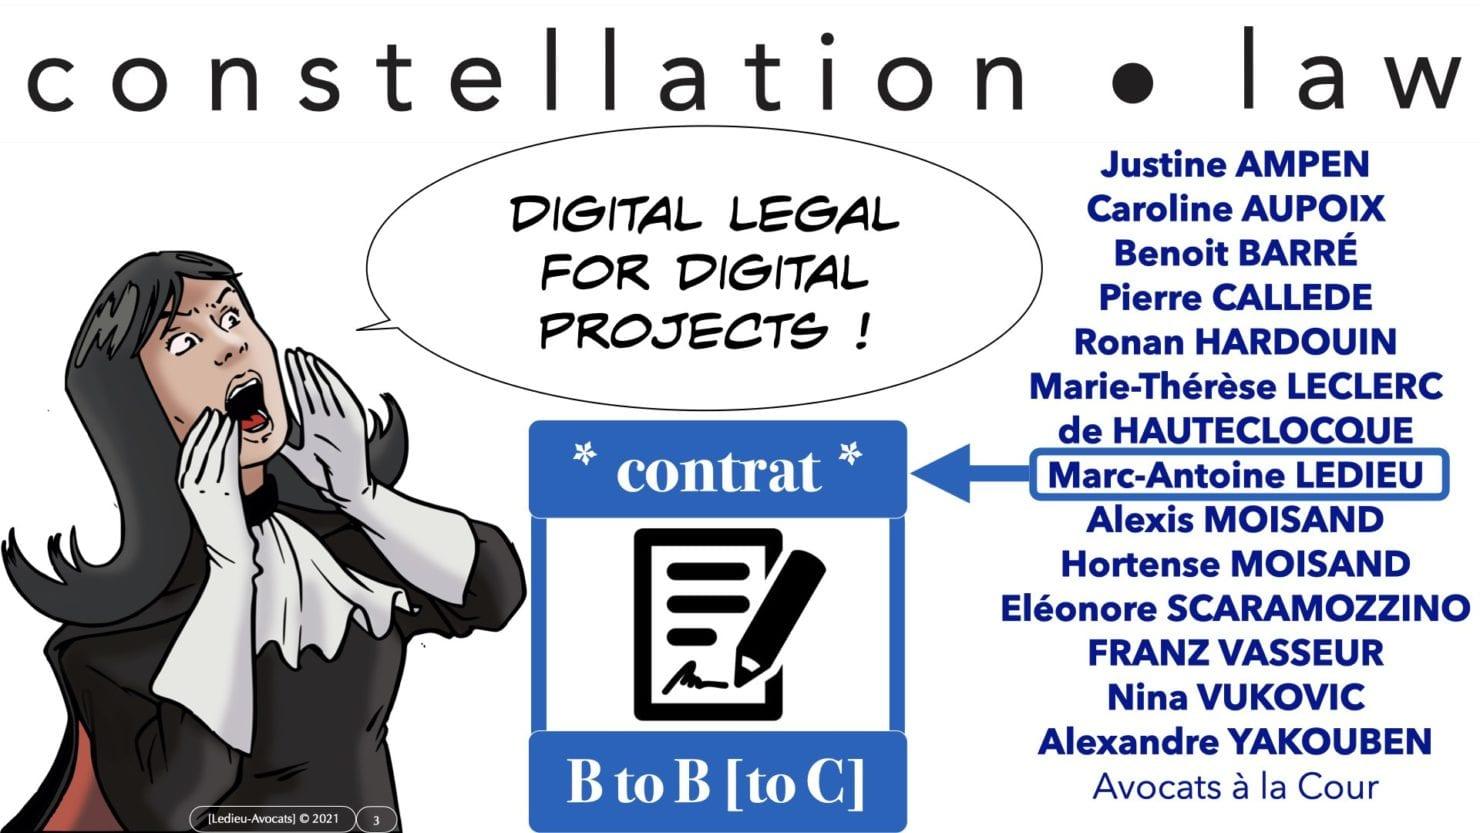 337 cyber sécurité #1 OIV OSE Critical Entities © Ledieu-avocat 15-06-2021.003